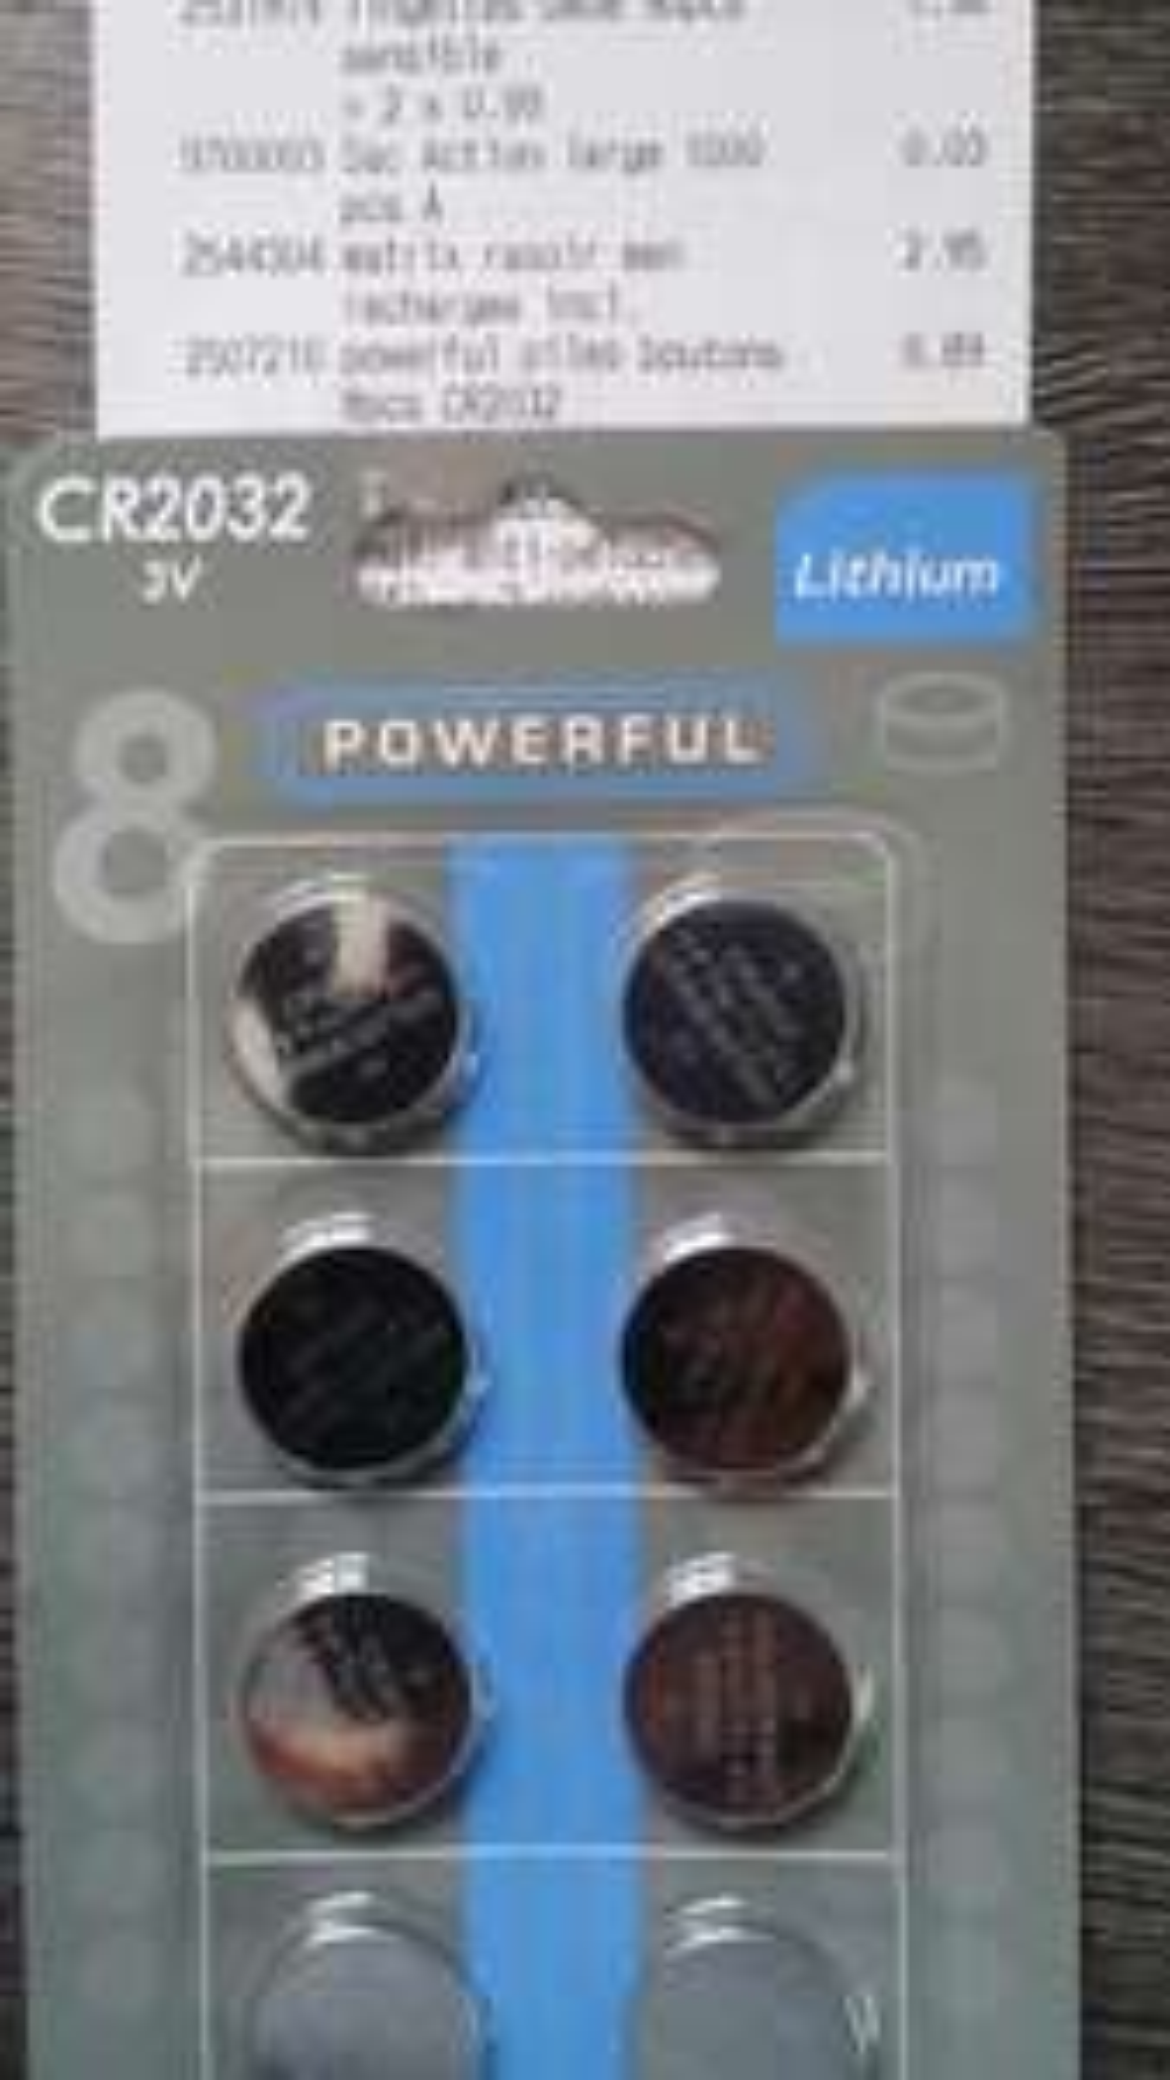 Lot de 8 piles CR2032 3V Lithium